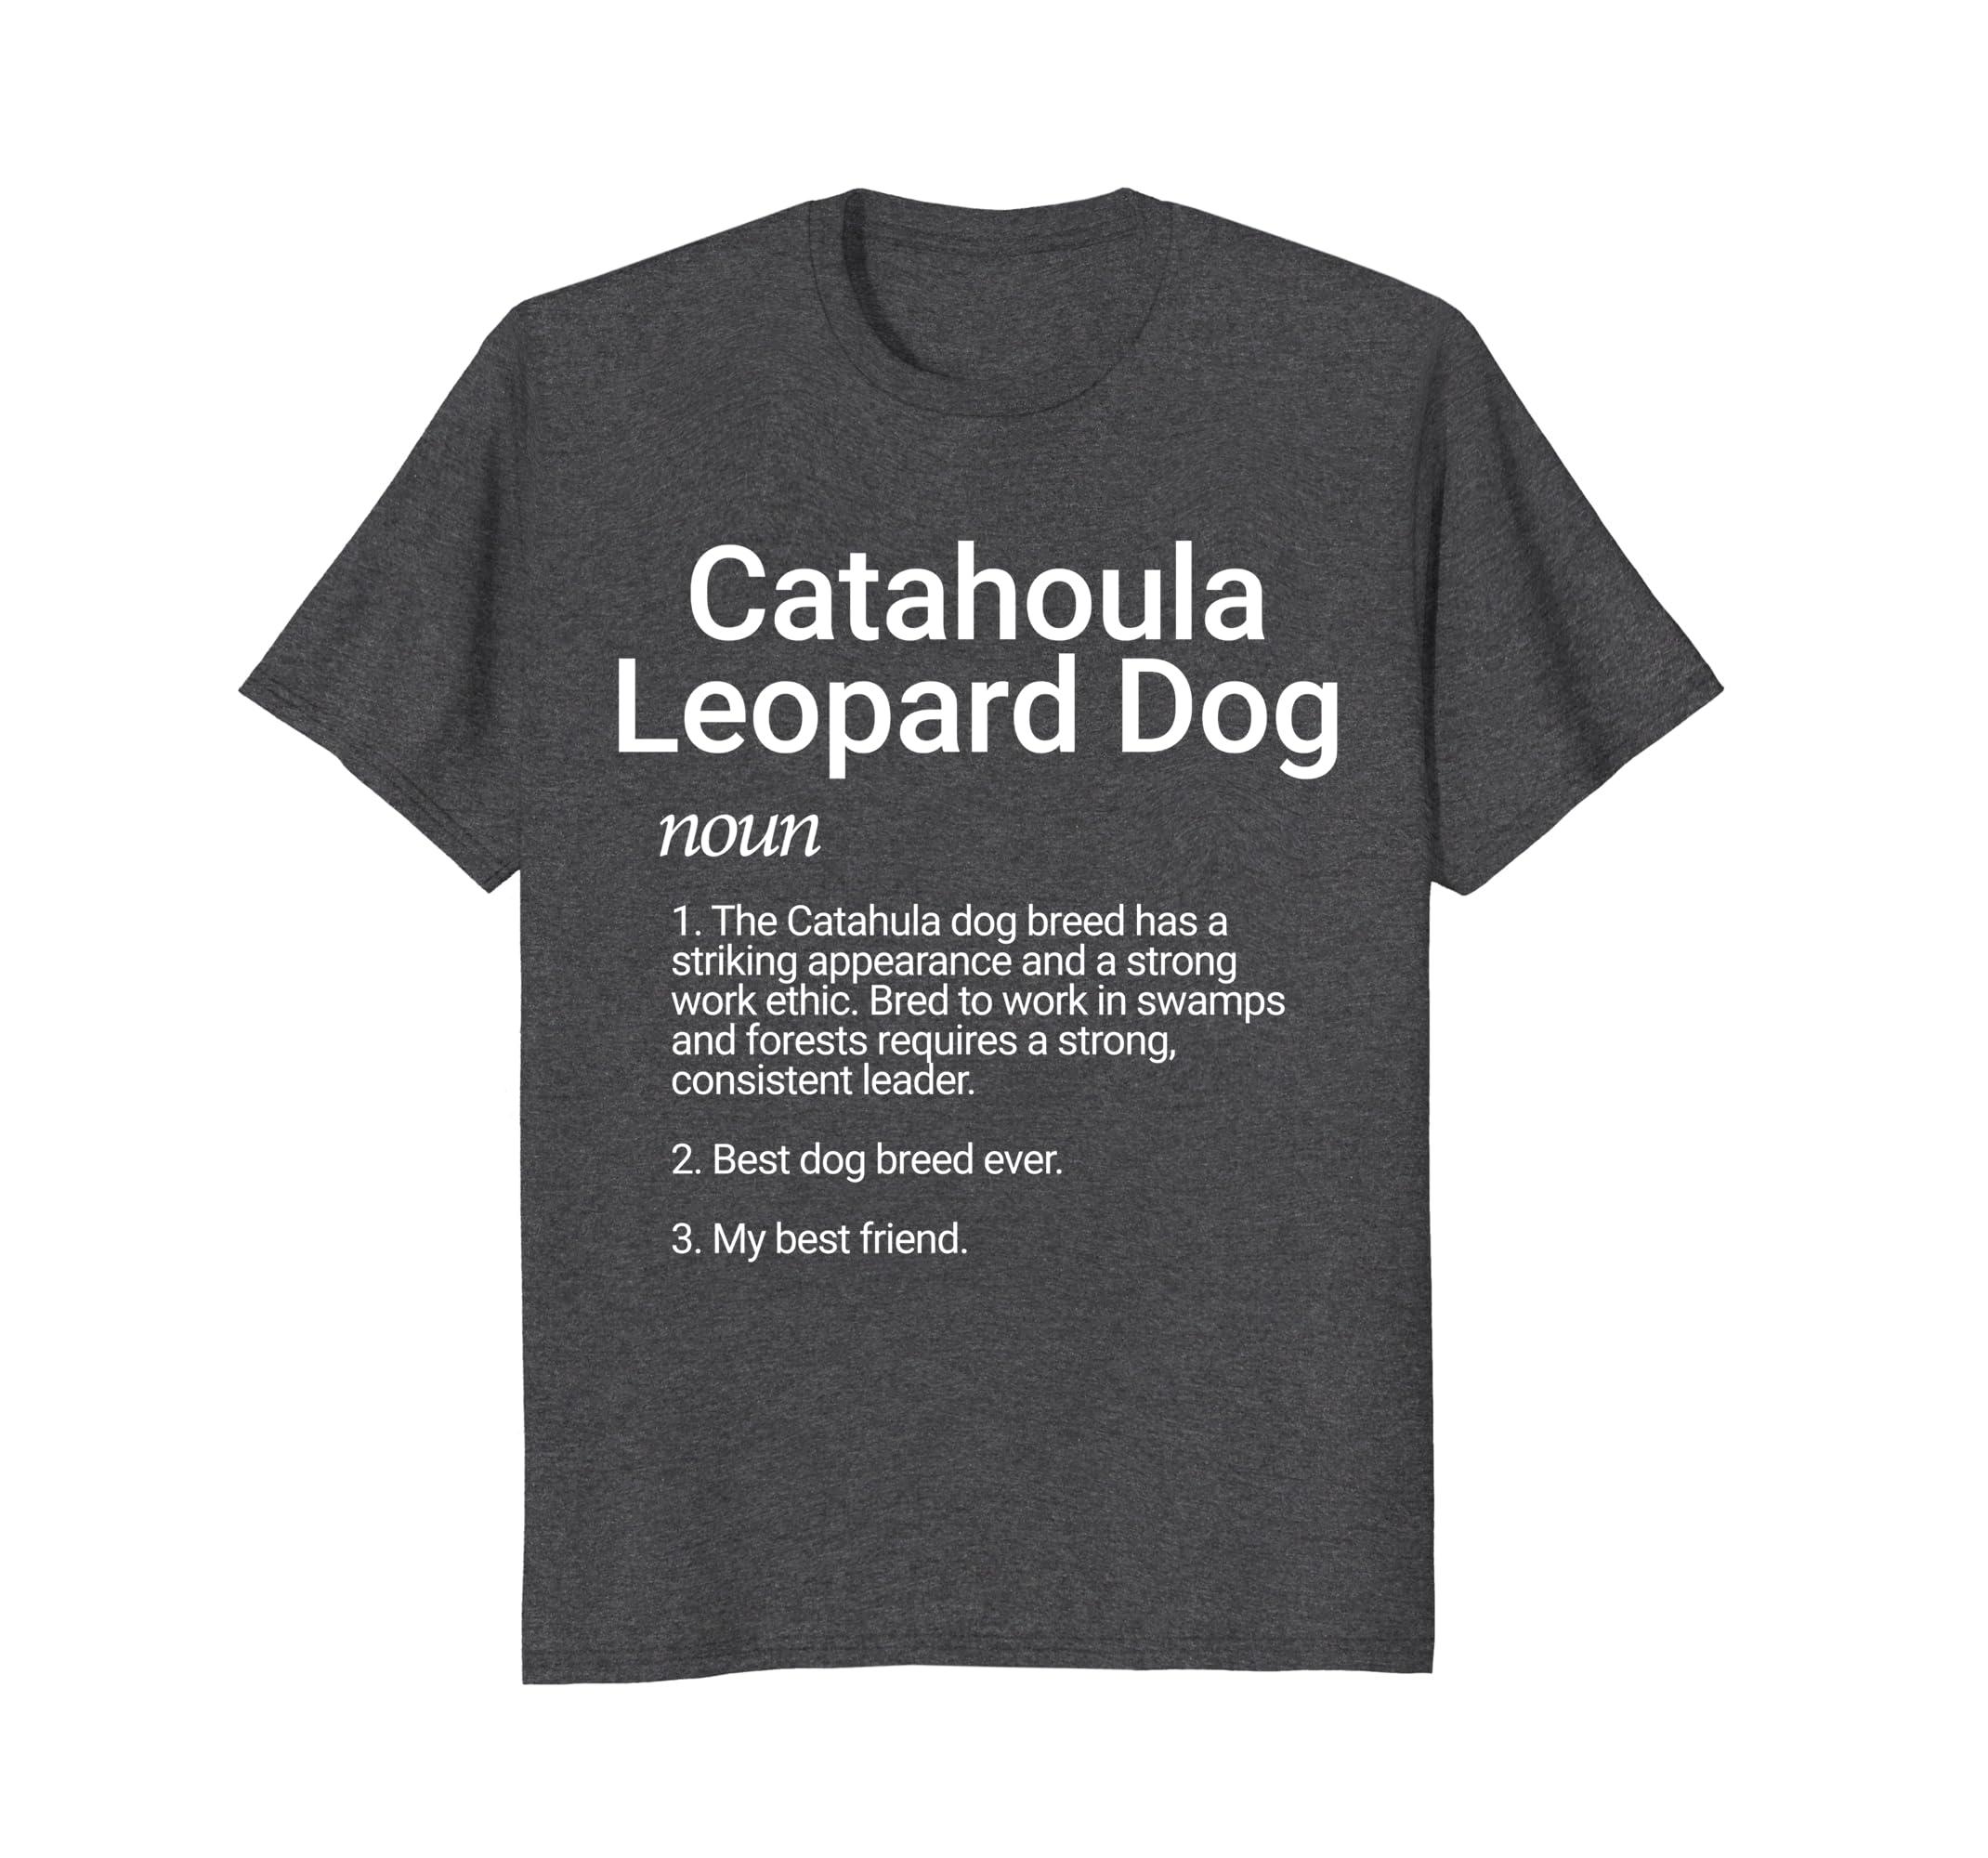 Catahoula Leopard Dog Breed Definition Shirt Dog Lover-AZP